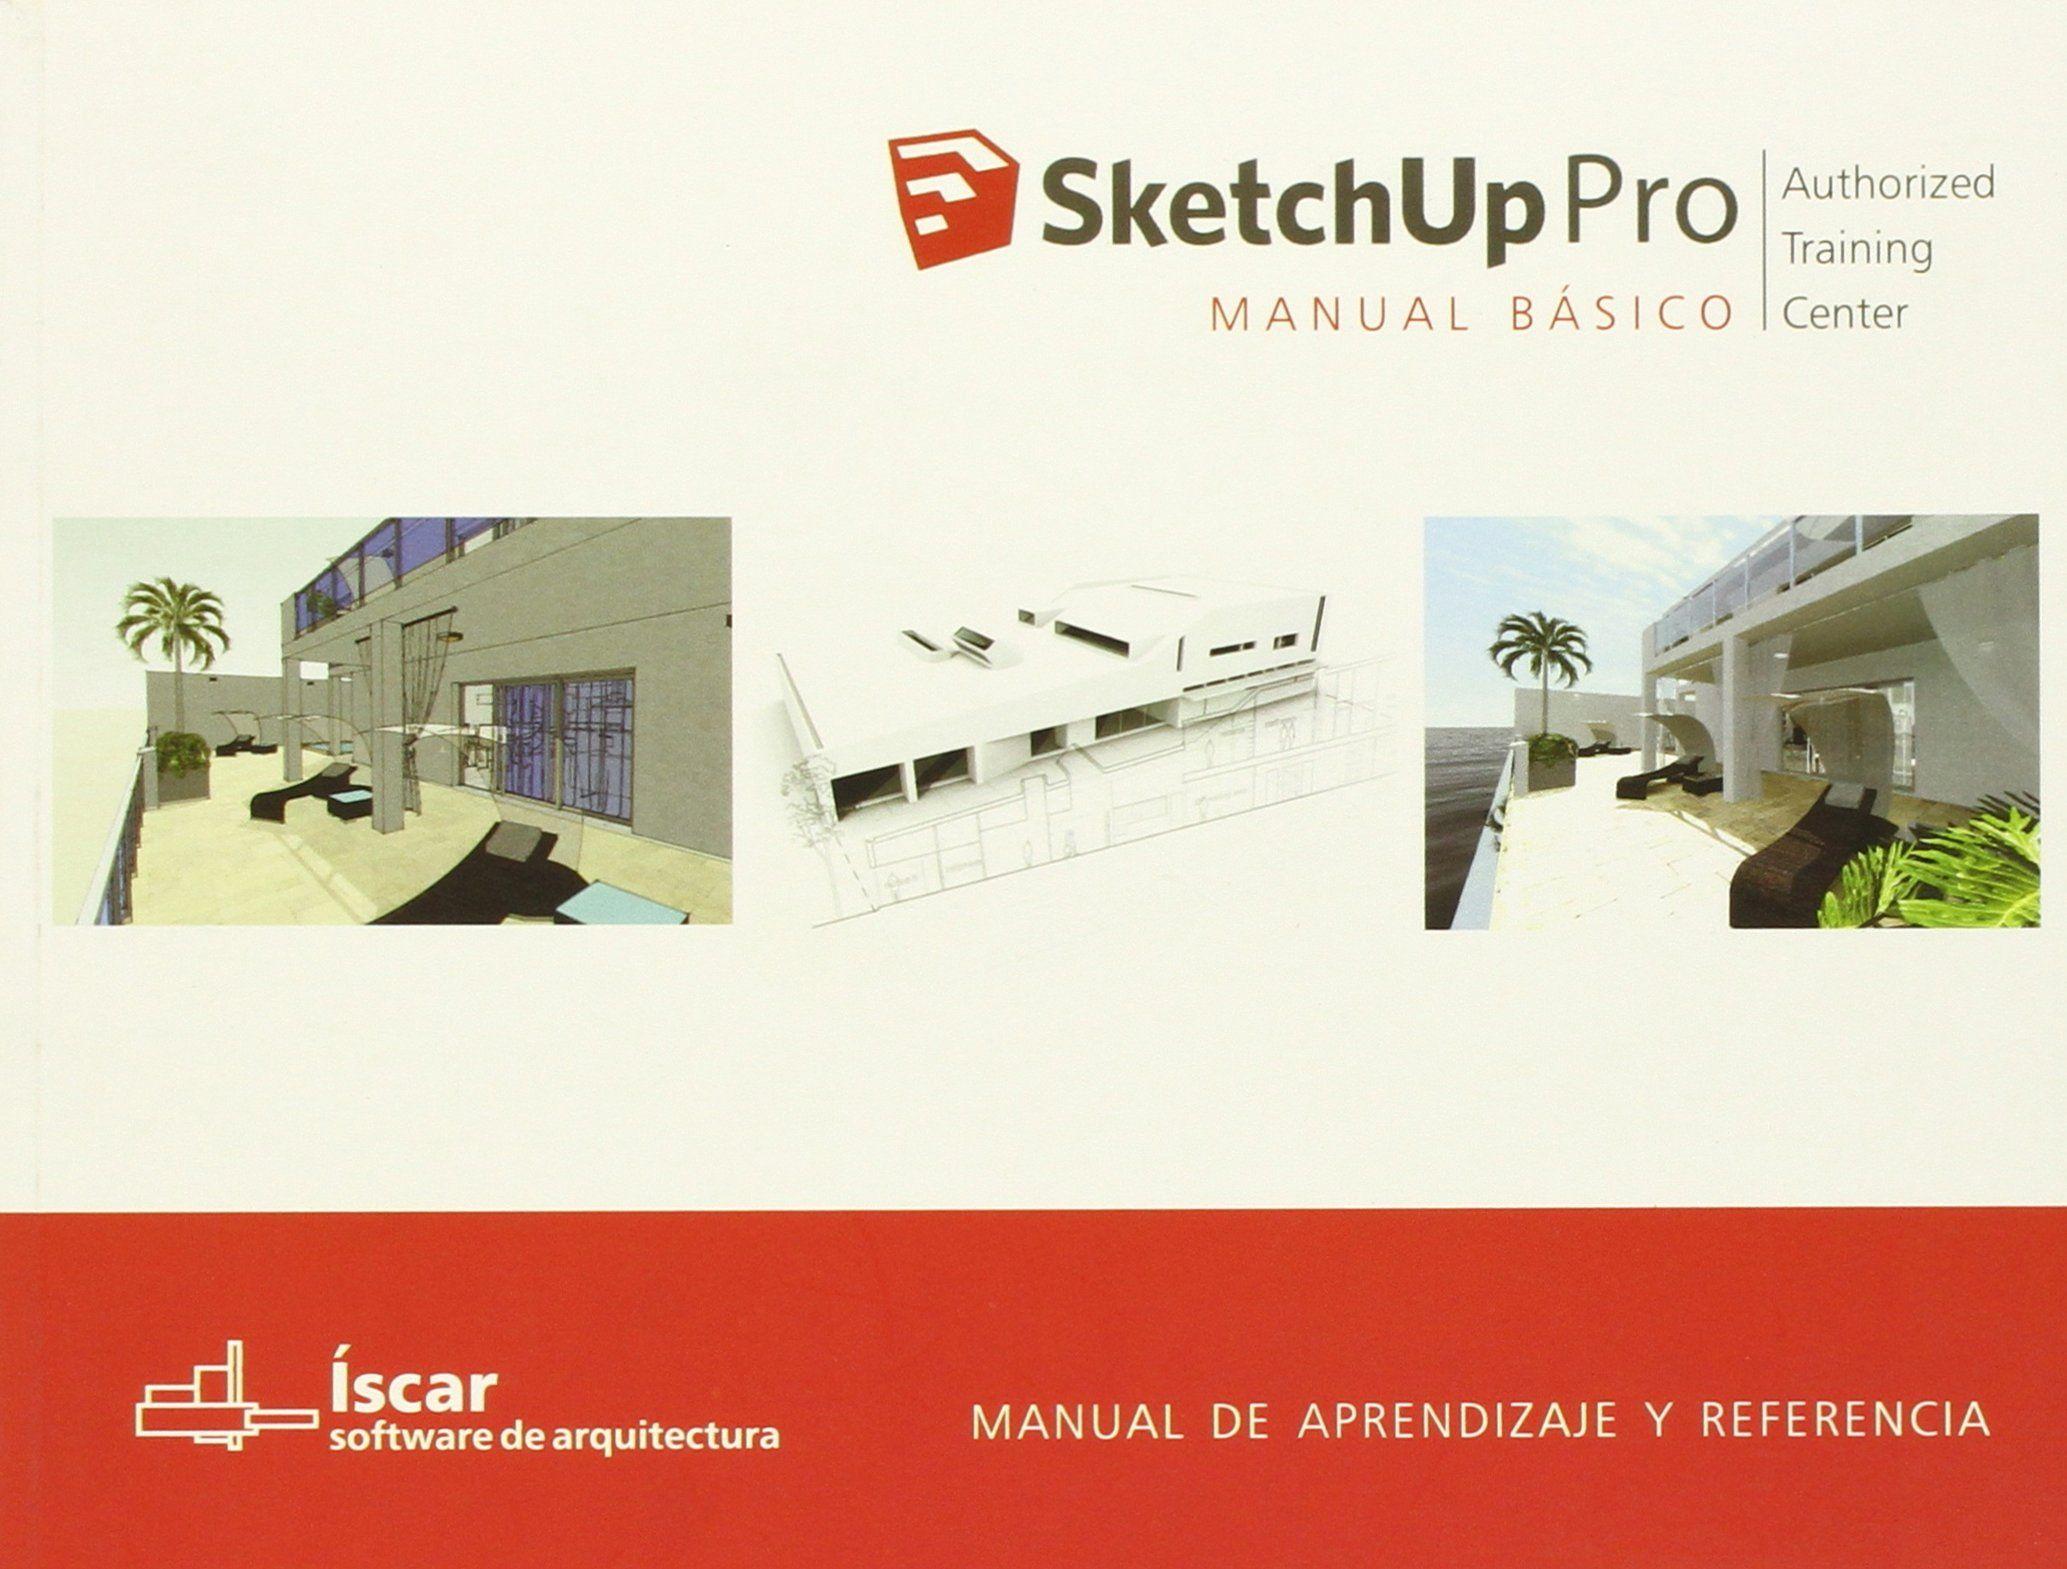 sketchup manual b sico manual de aprendizaje y referencia rh pinterest com sketchup user guide sketchup user's guide pdf